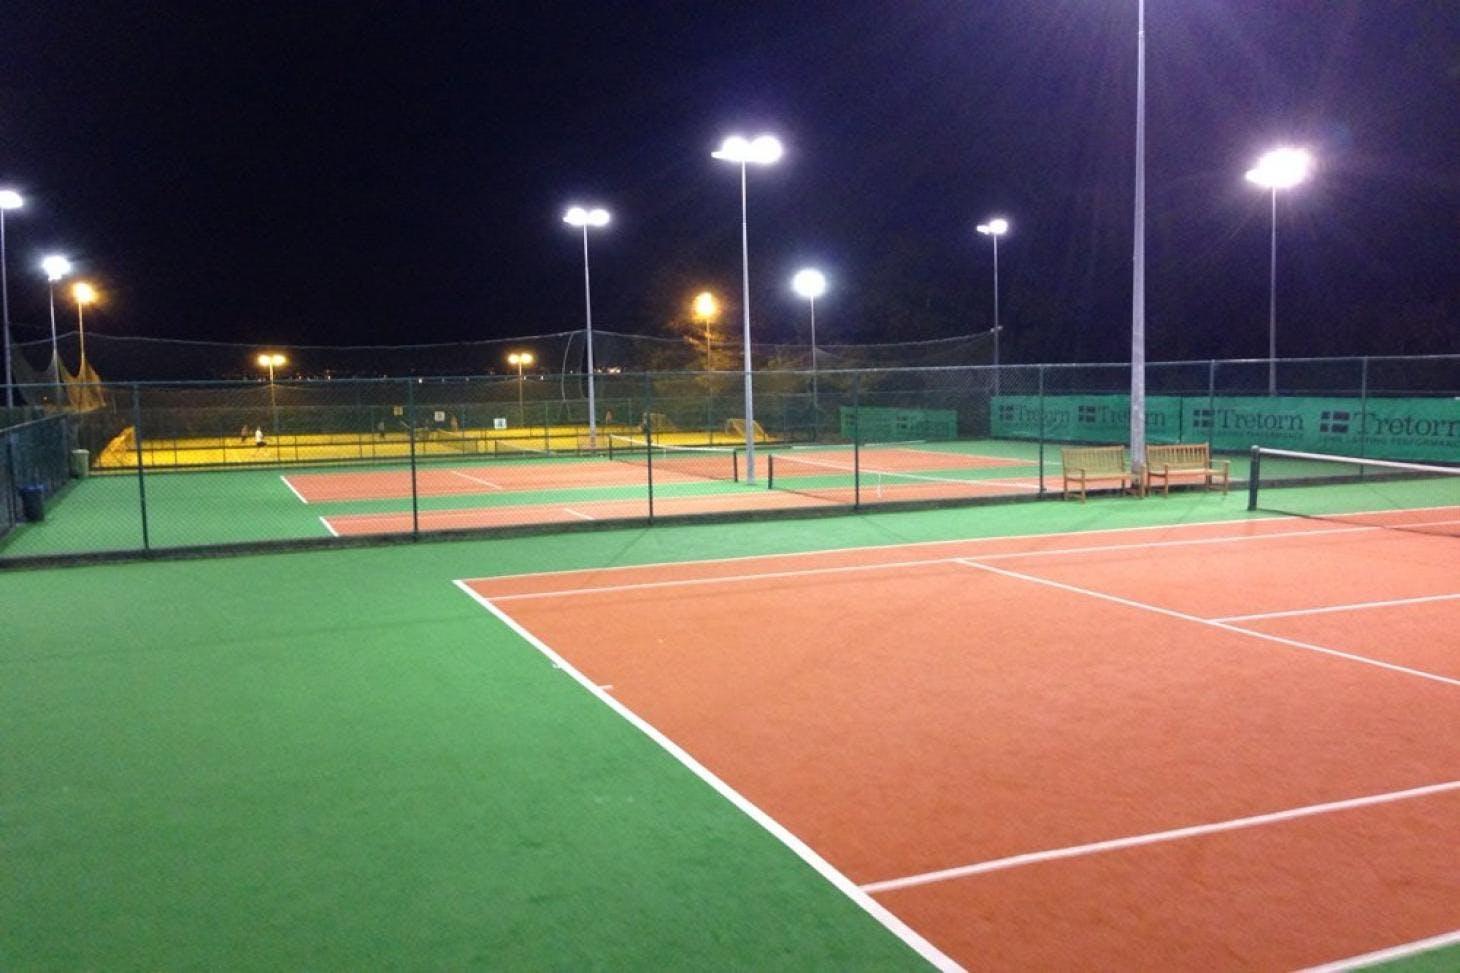 Portmarnock Sports & Leisure Club Outdoor | Astroturf tennis court